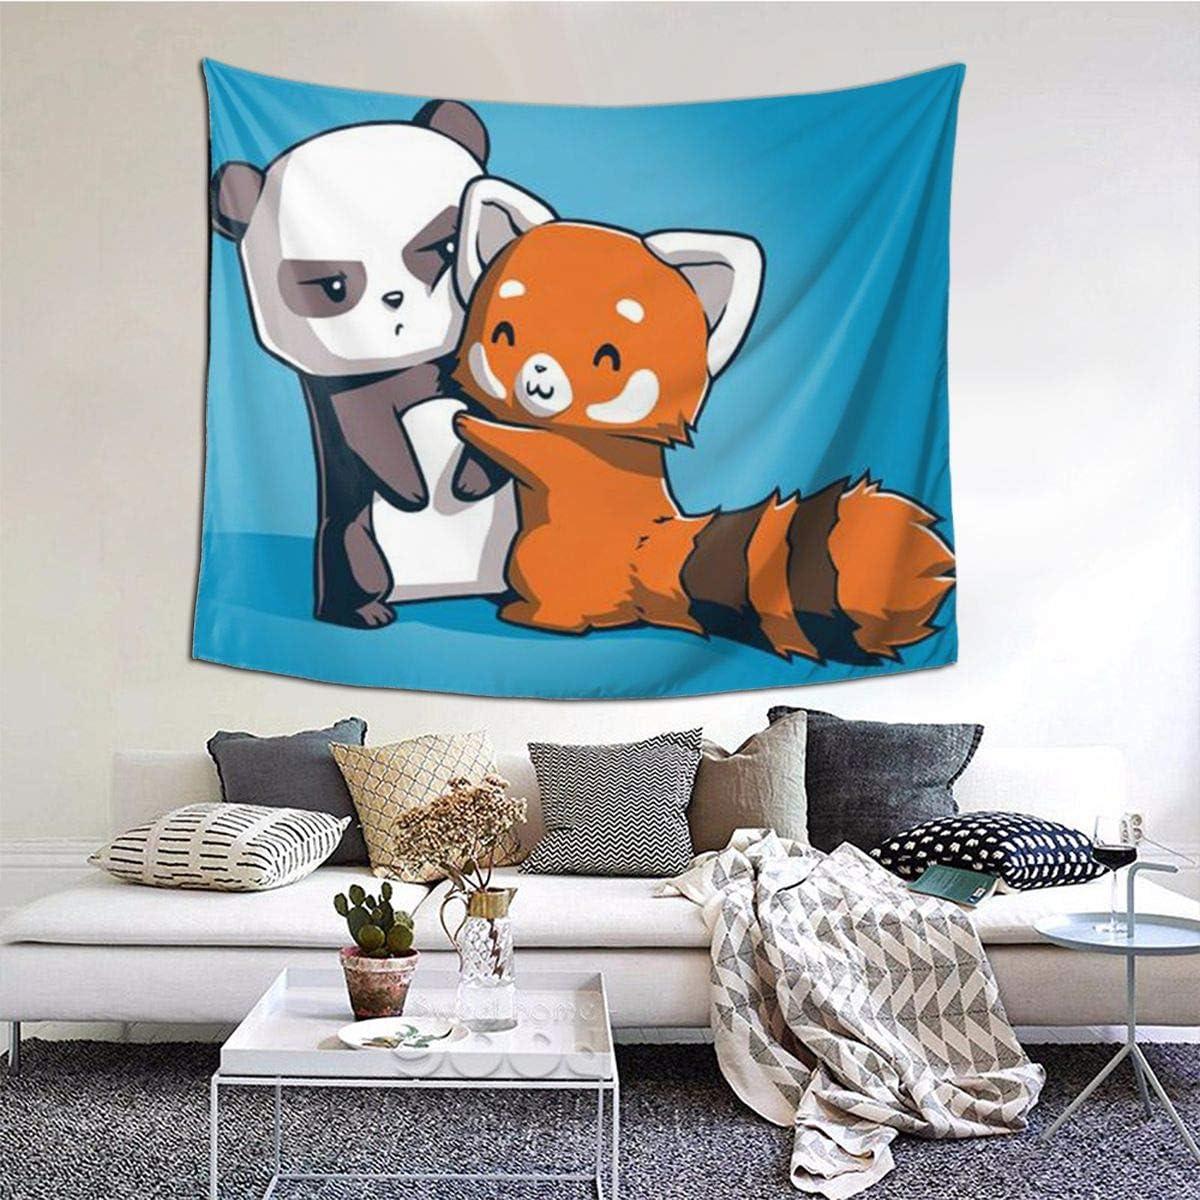 Kwhy Cartoon Animal Panda Printed Tapestry 60 X 51 , Tapestries Wall Hanging Art Decor for Living Room Bedroom Dorm